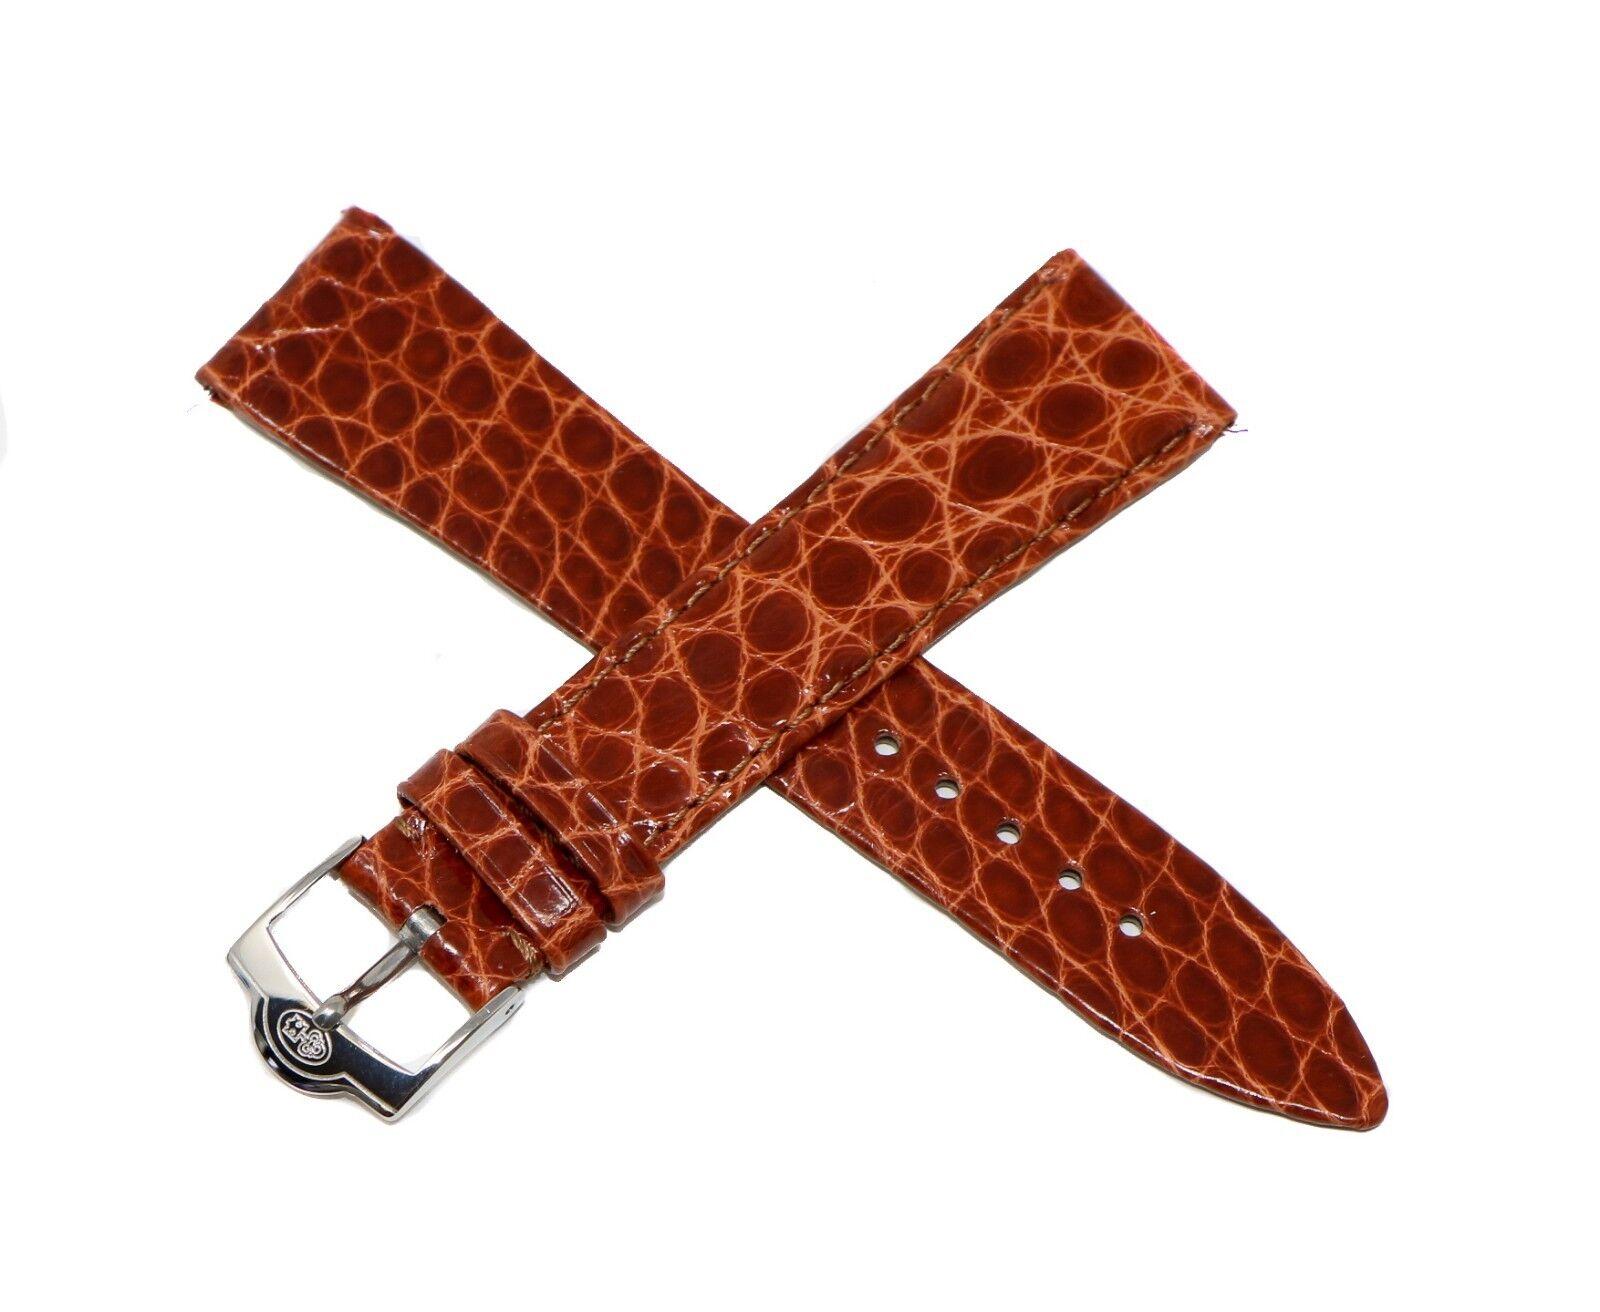 Originales Corum Uhrenarmband 20 mm Alligatorenleder Braun